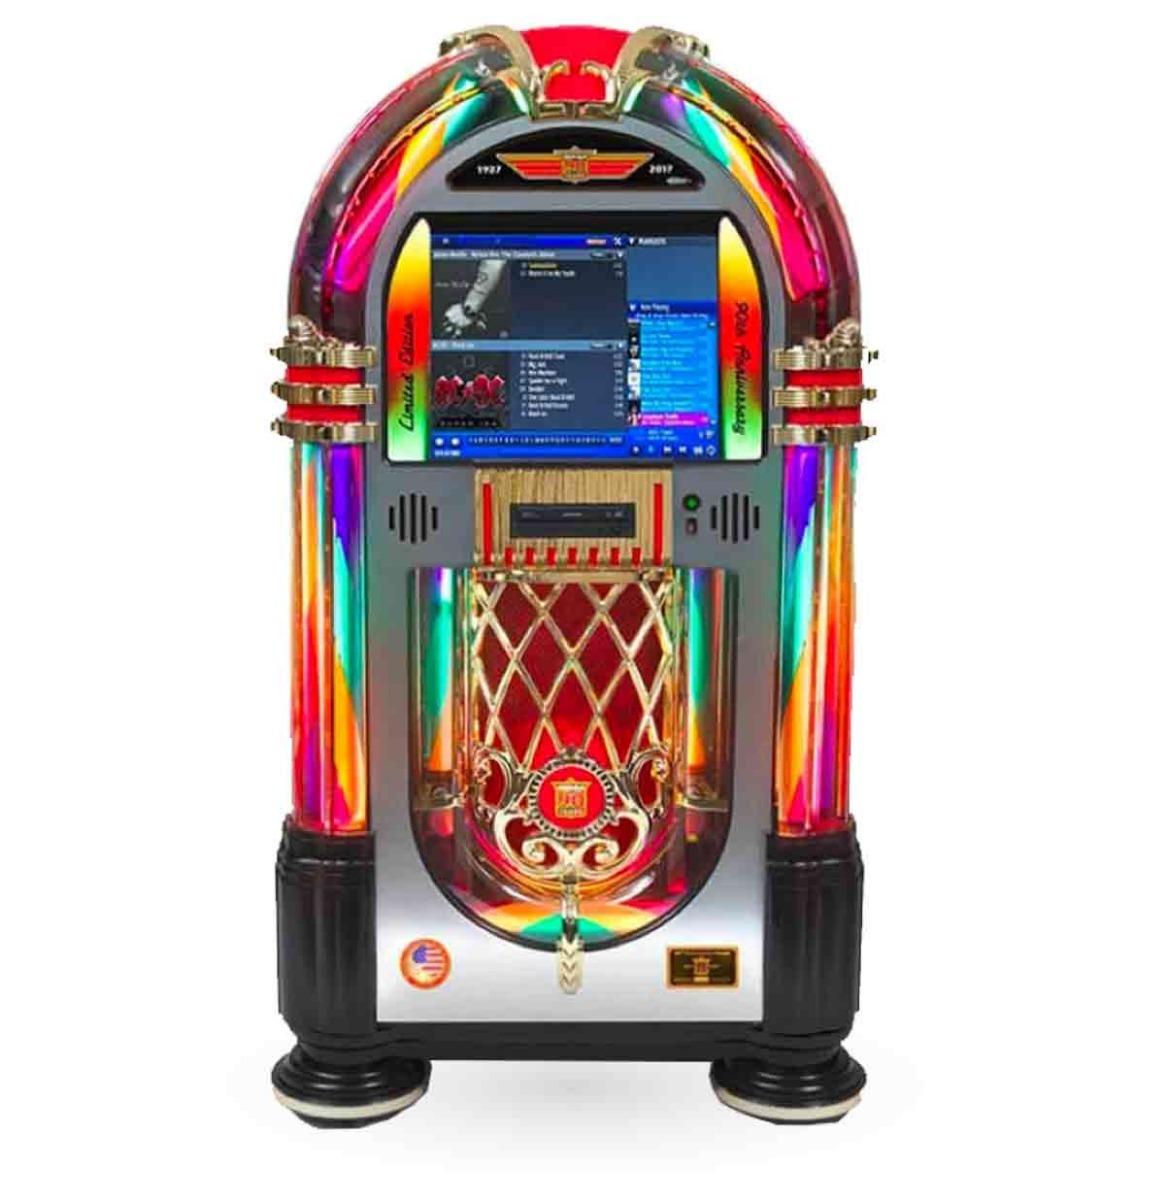 Rock-Ola Bubbler Digital Music Center Jukebox - 90 Jarig Jubileummodel